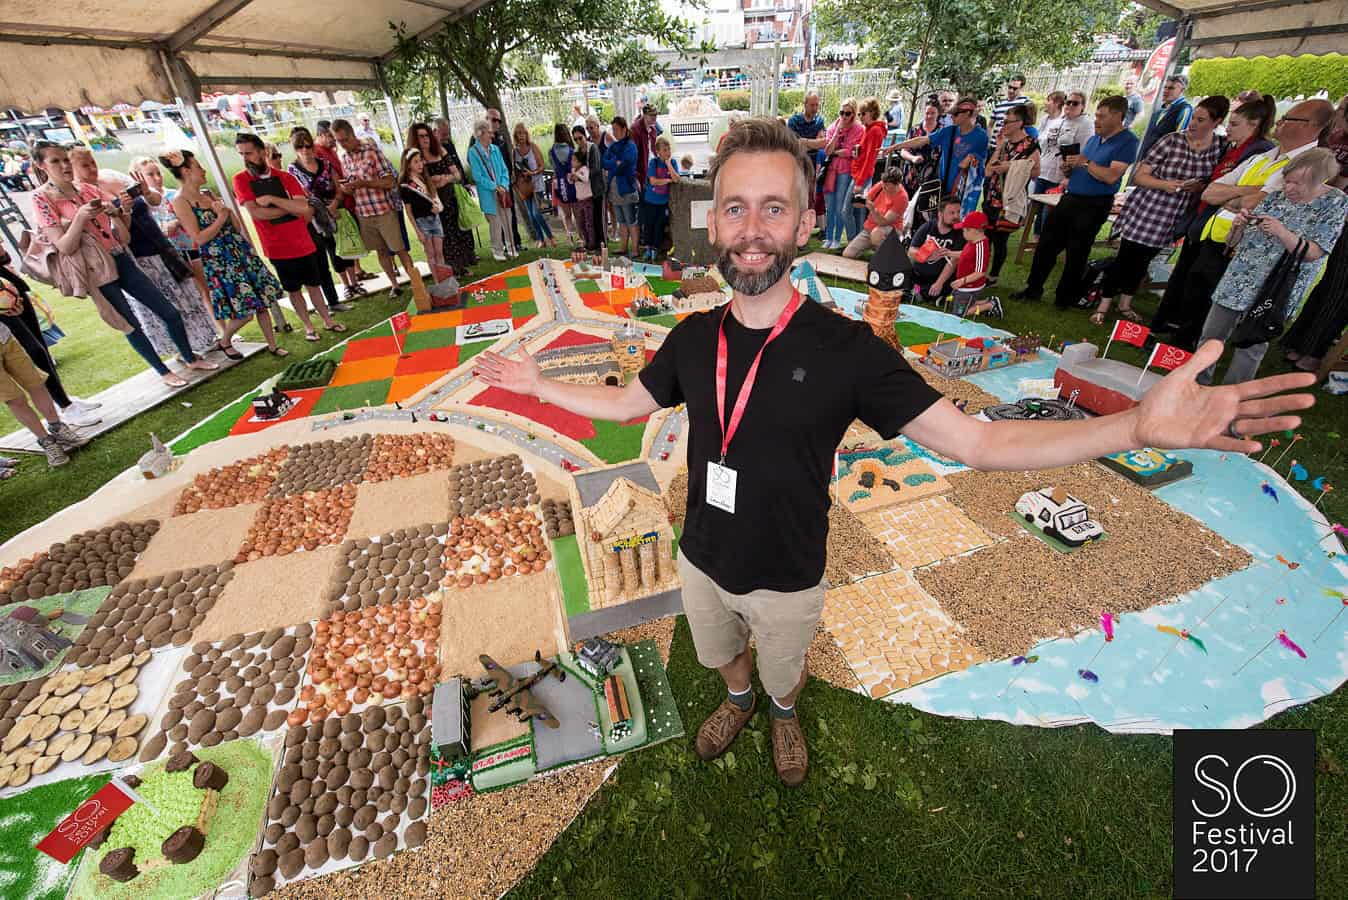 SO Cake Fest - Simon Preston, SO Festival 2017